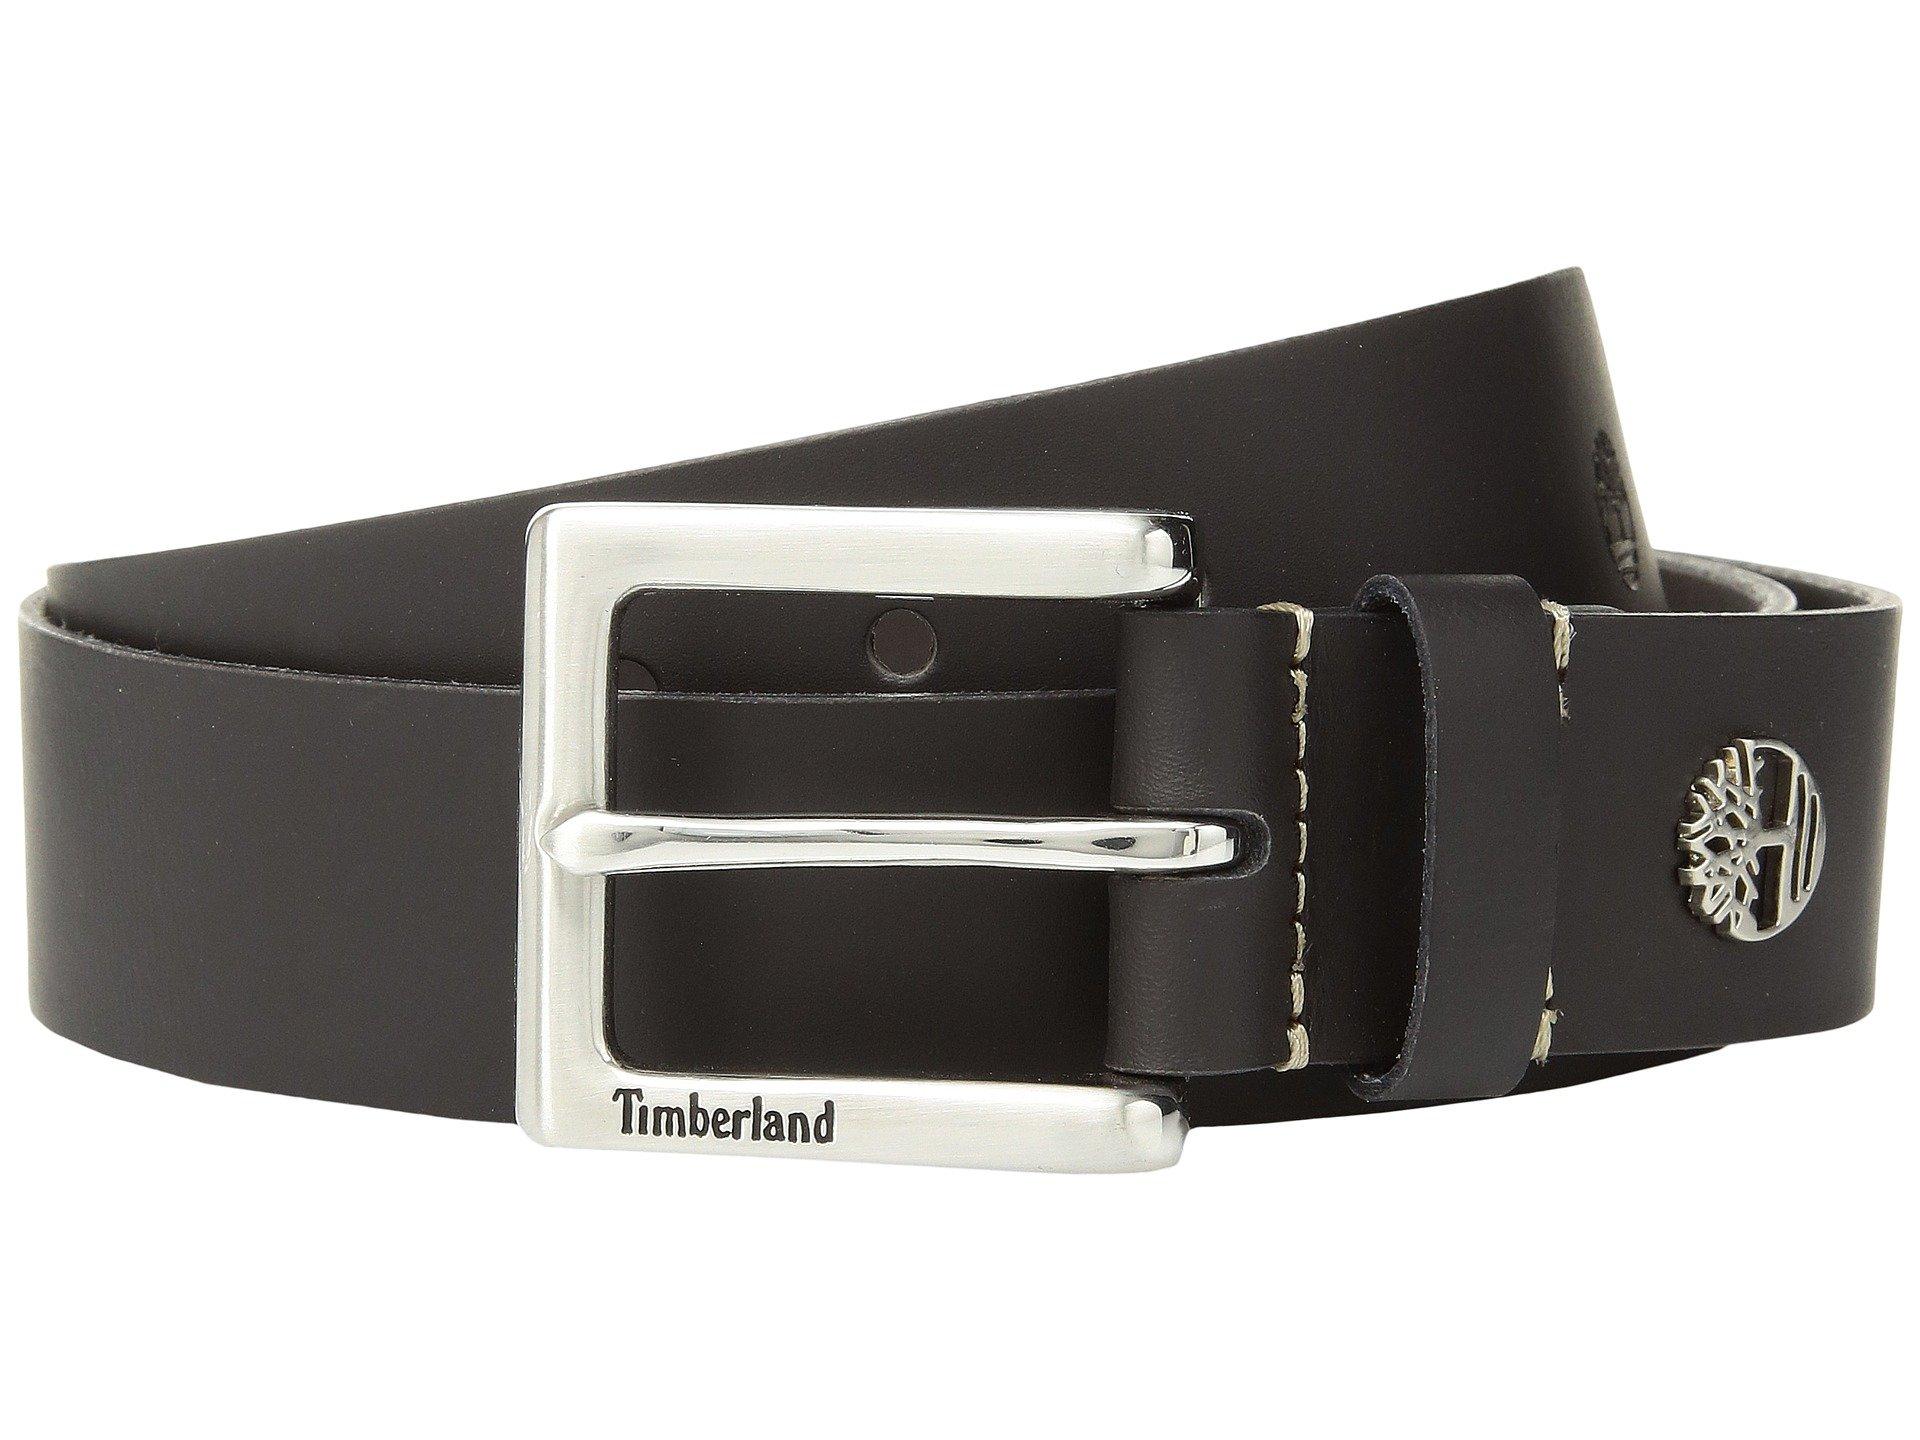 Correa o Cinturon para Hombre Timberland 40mm Saddle Belt  + Timberland en VeoyCompro.net